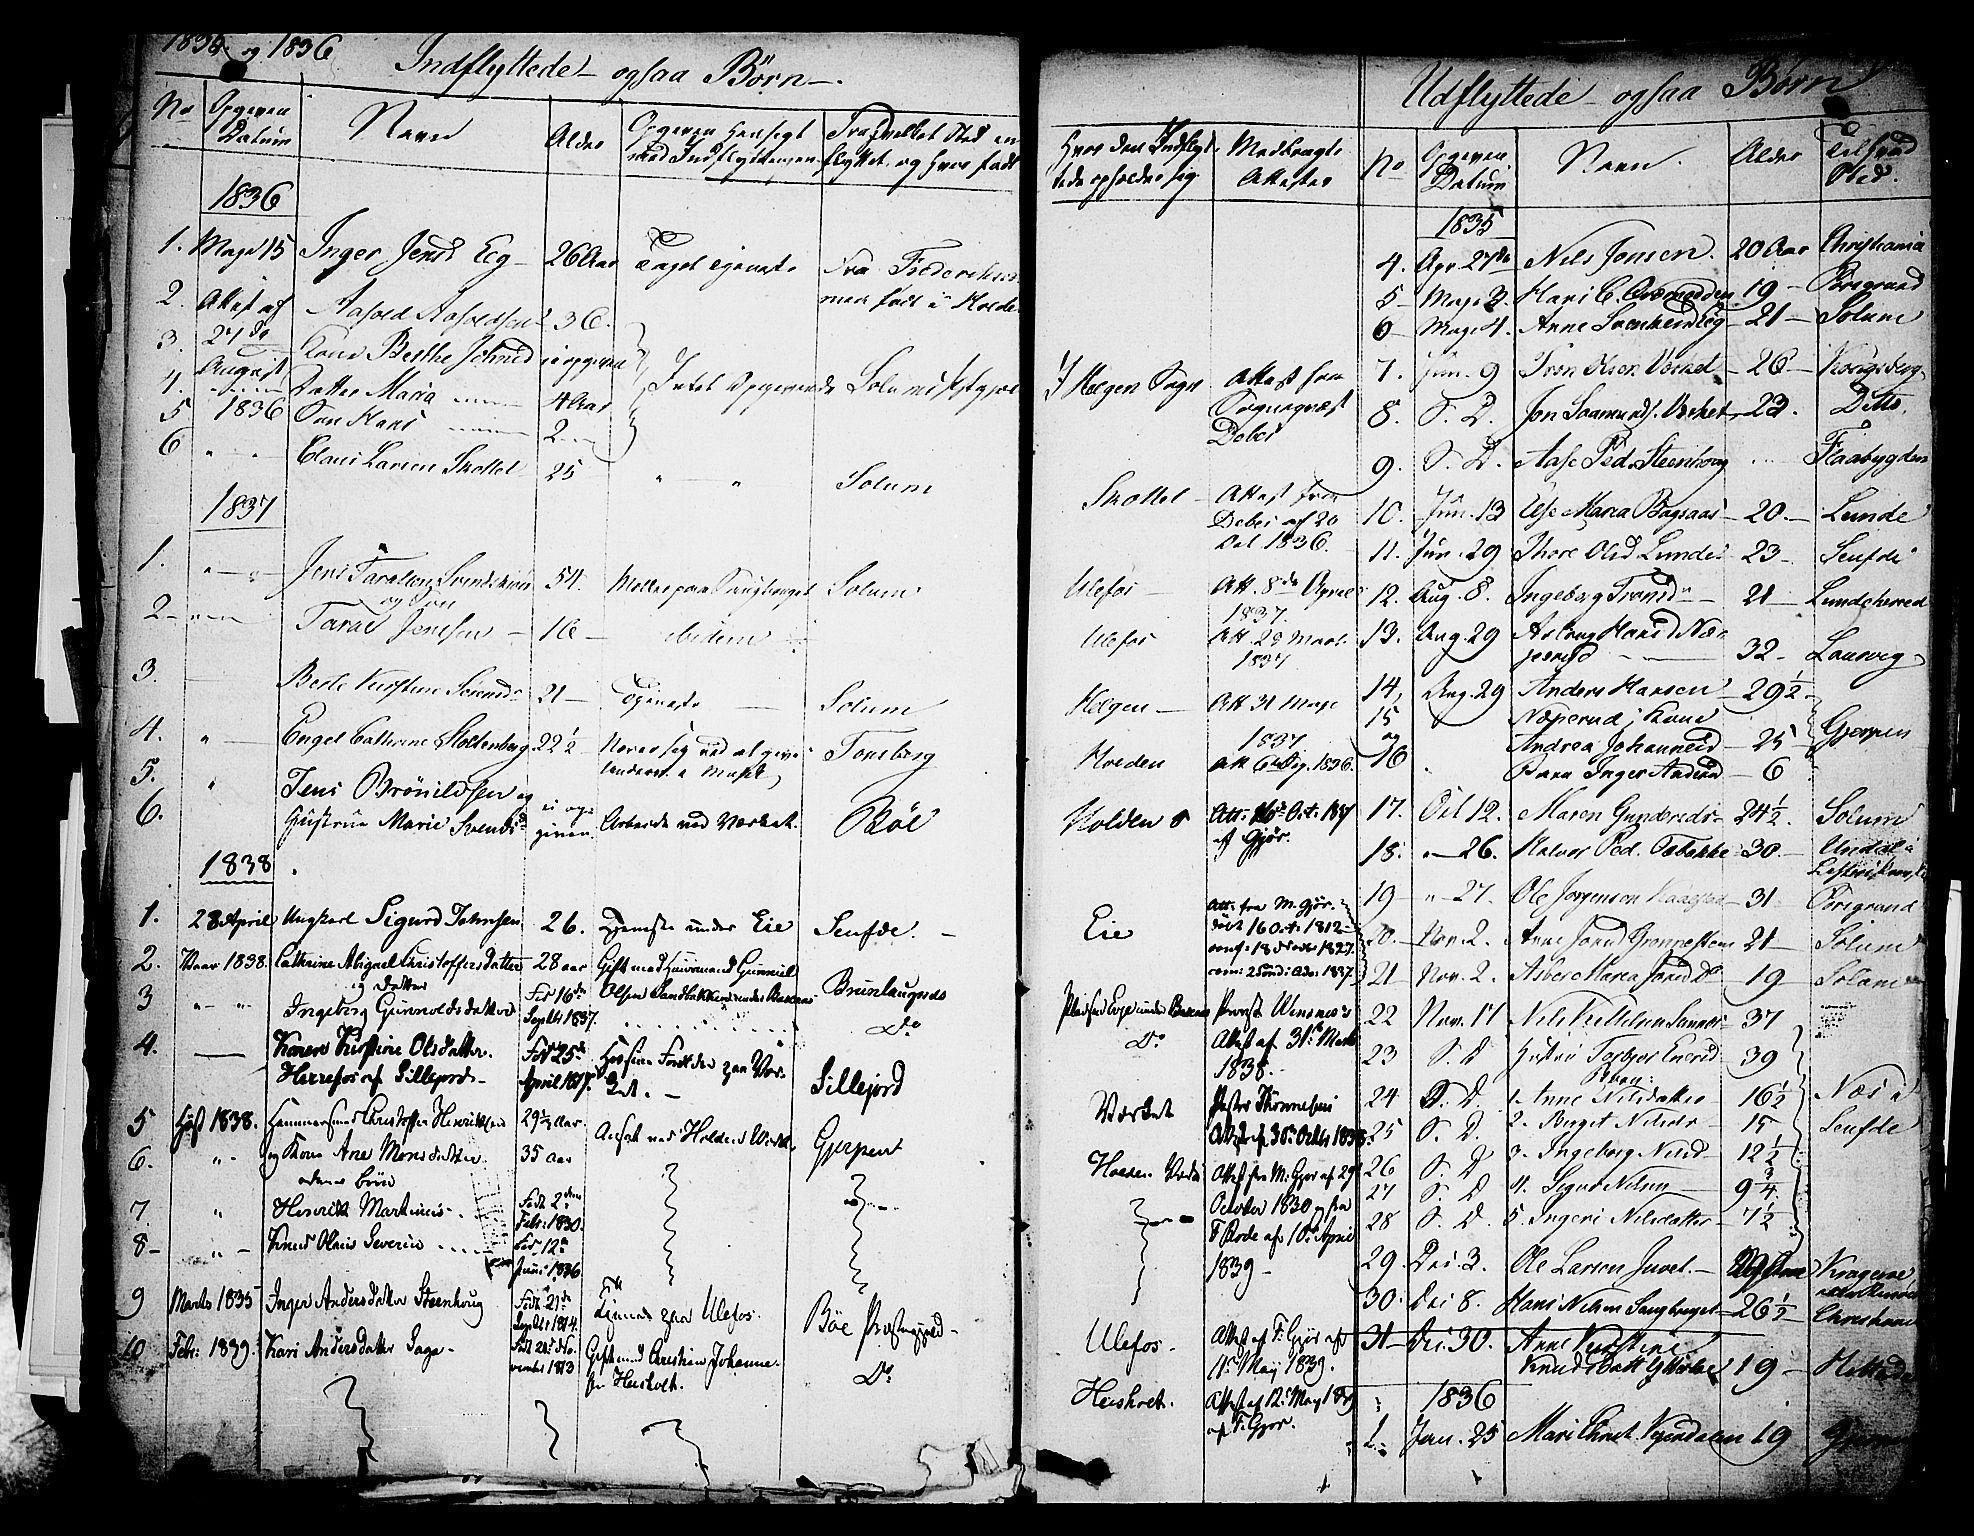 SAKO, Holla kirkebøker, F/Fa/L0004: Ministerialbok nr. 4, 1830-1848, s. 395